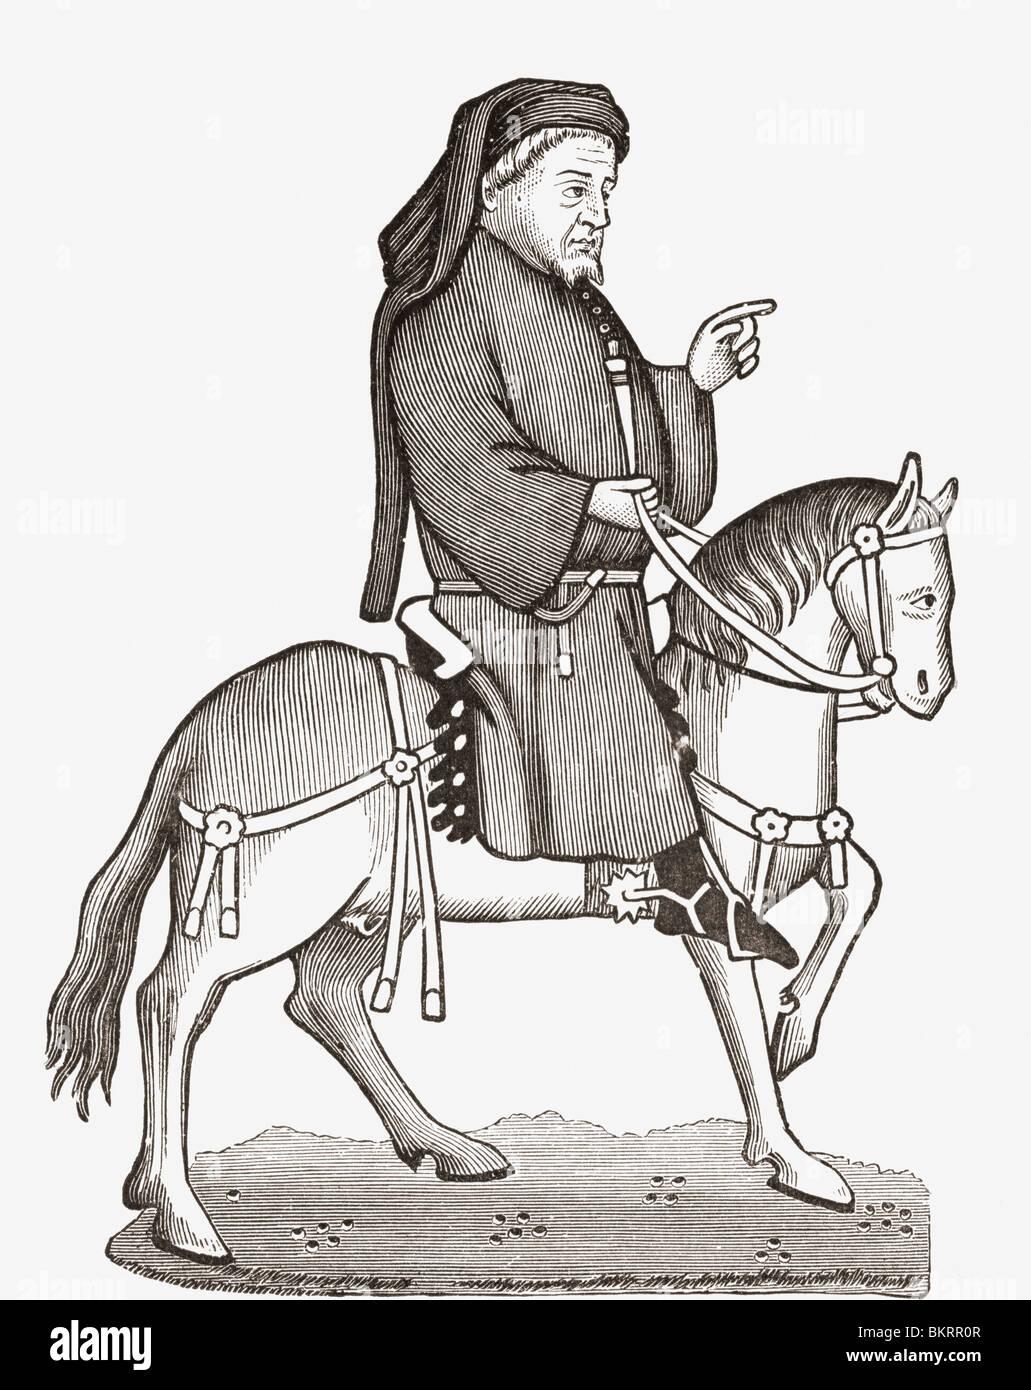 Geoffrey Chaucer c. 1343 to 1400. English author, poet, philosopher, bureaucrat, courtier and diplomat. - Stock Image